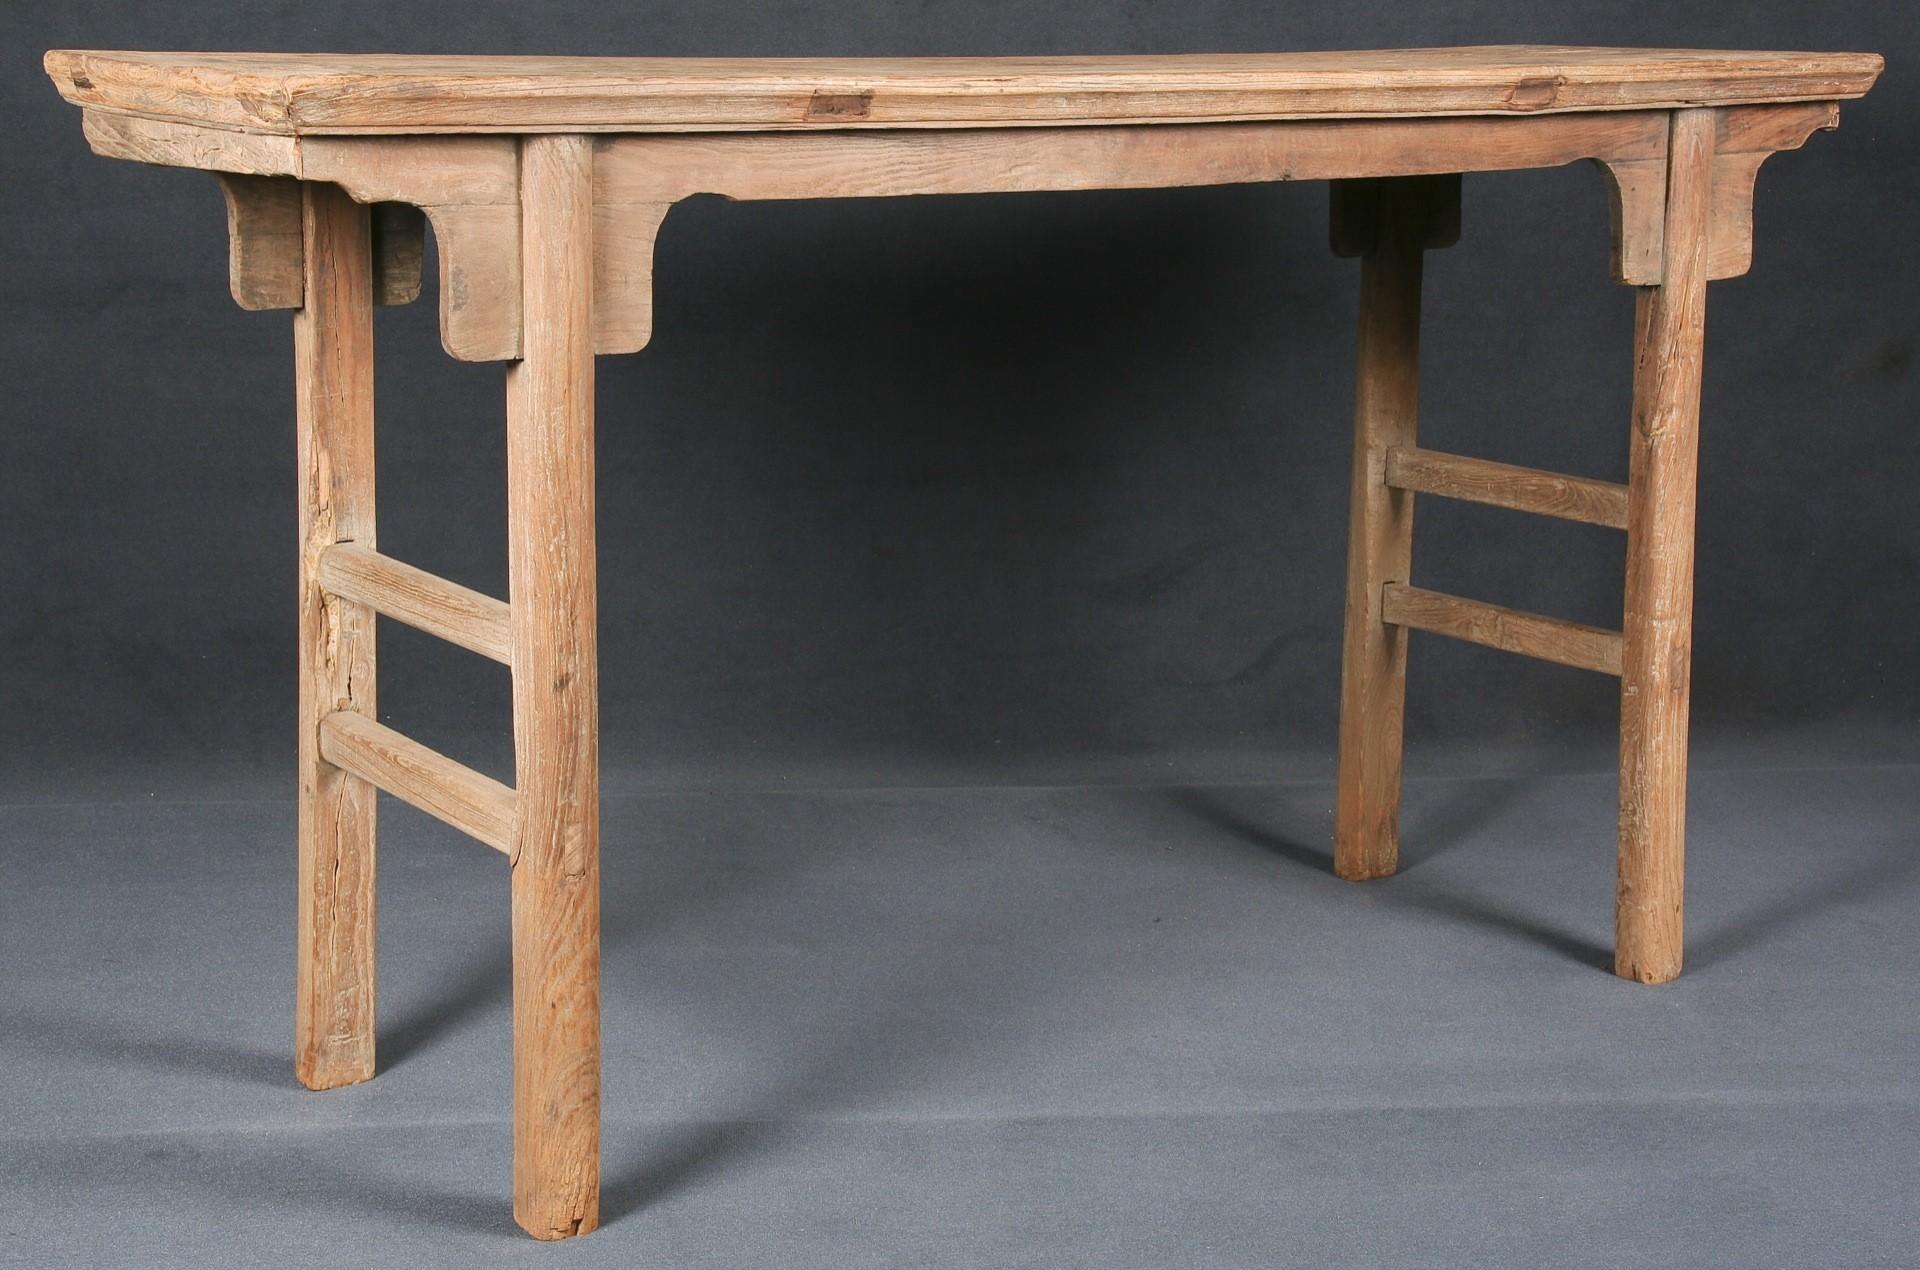 Consola y consola antigua batavia for Consolas antiguas muebles